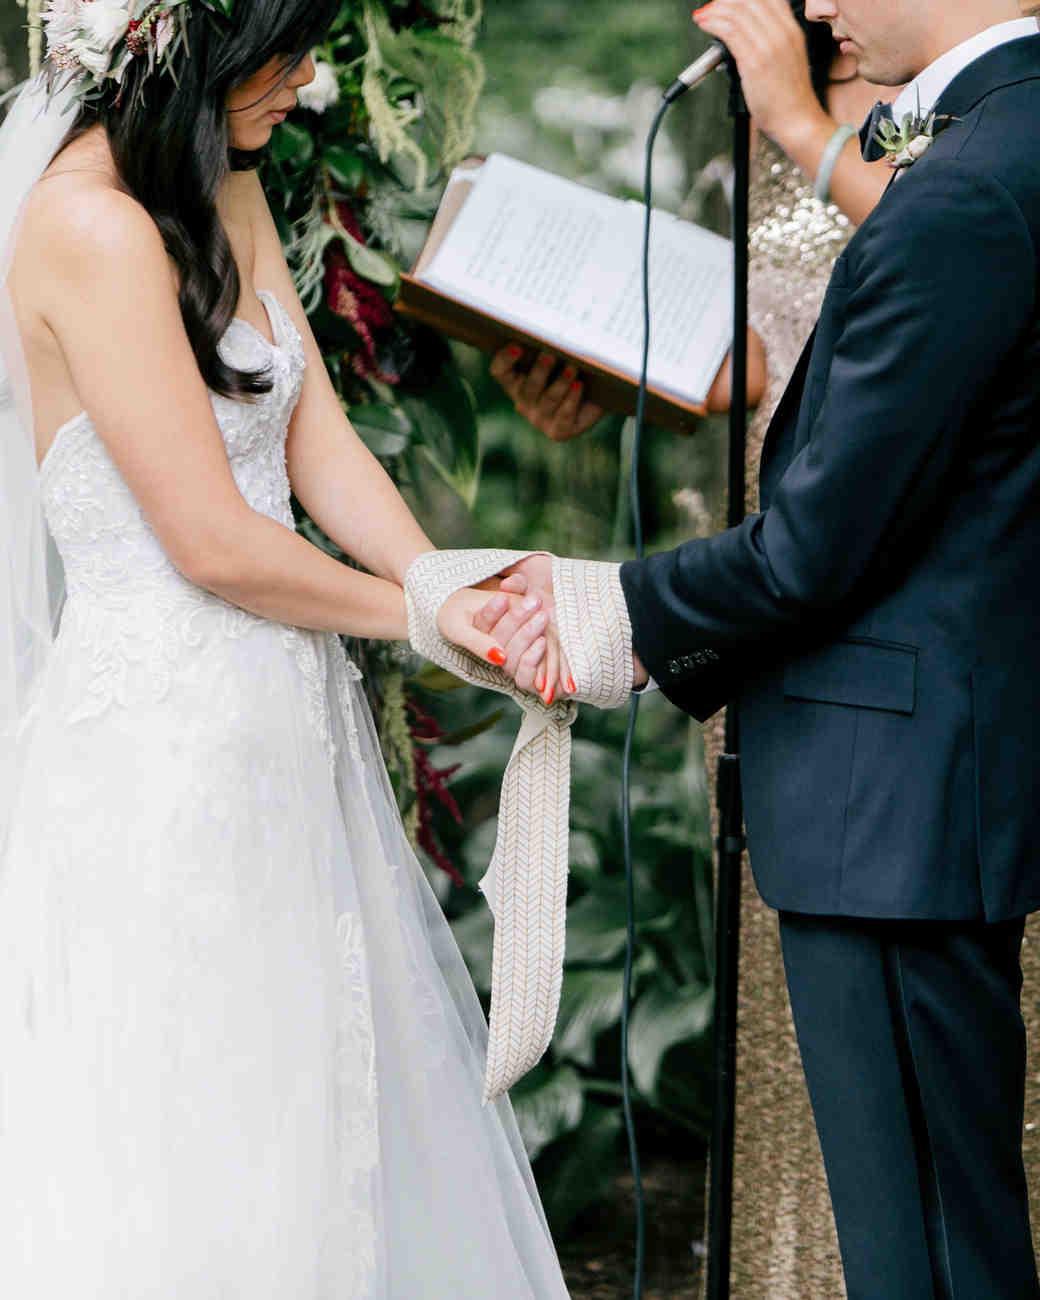 susan-tom-wedding-handtying-152-s112692-0316.jpg